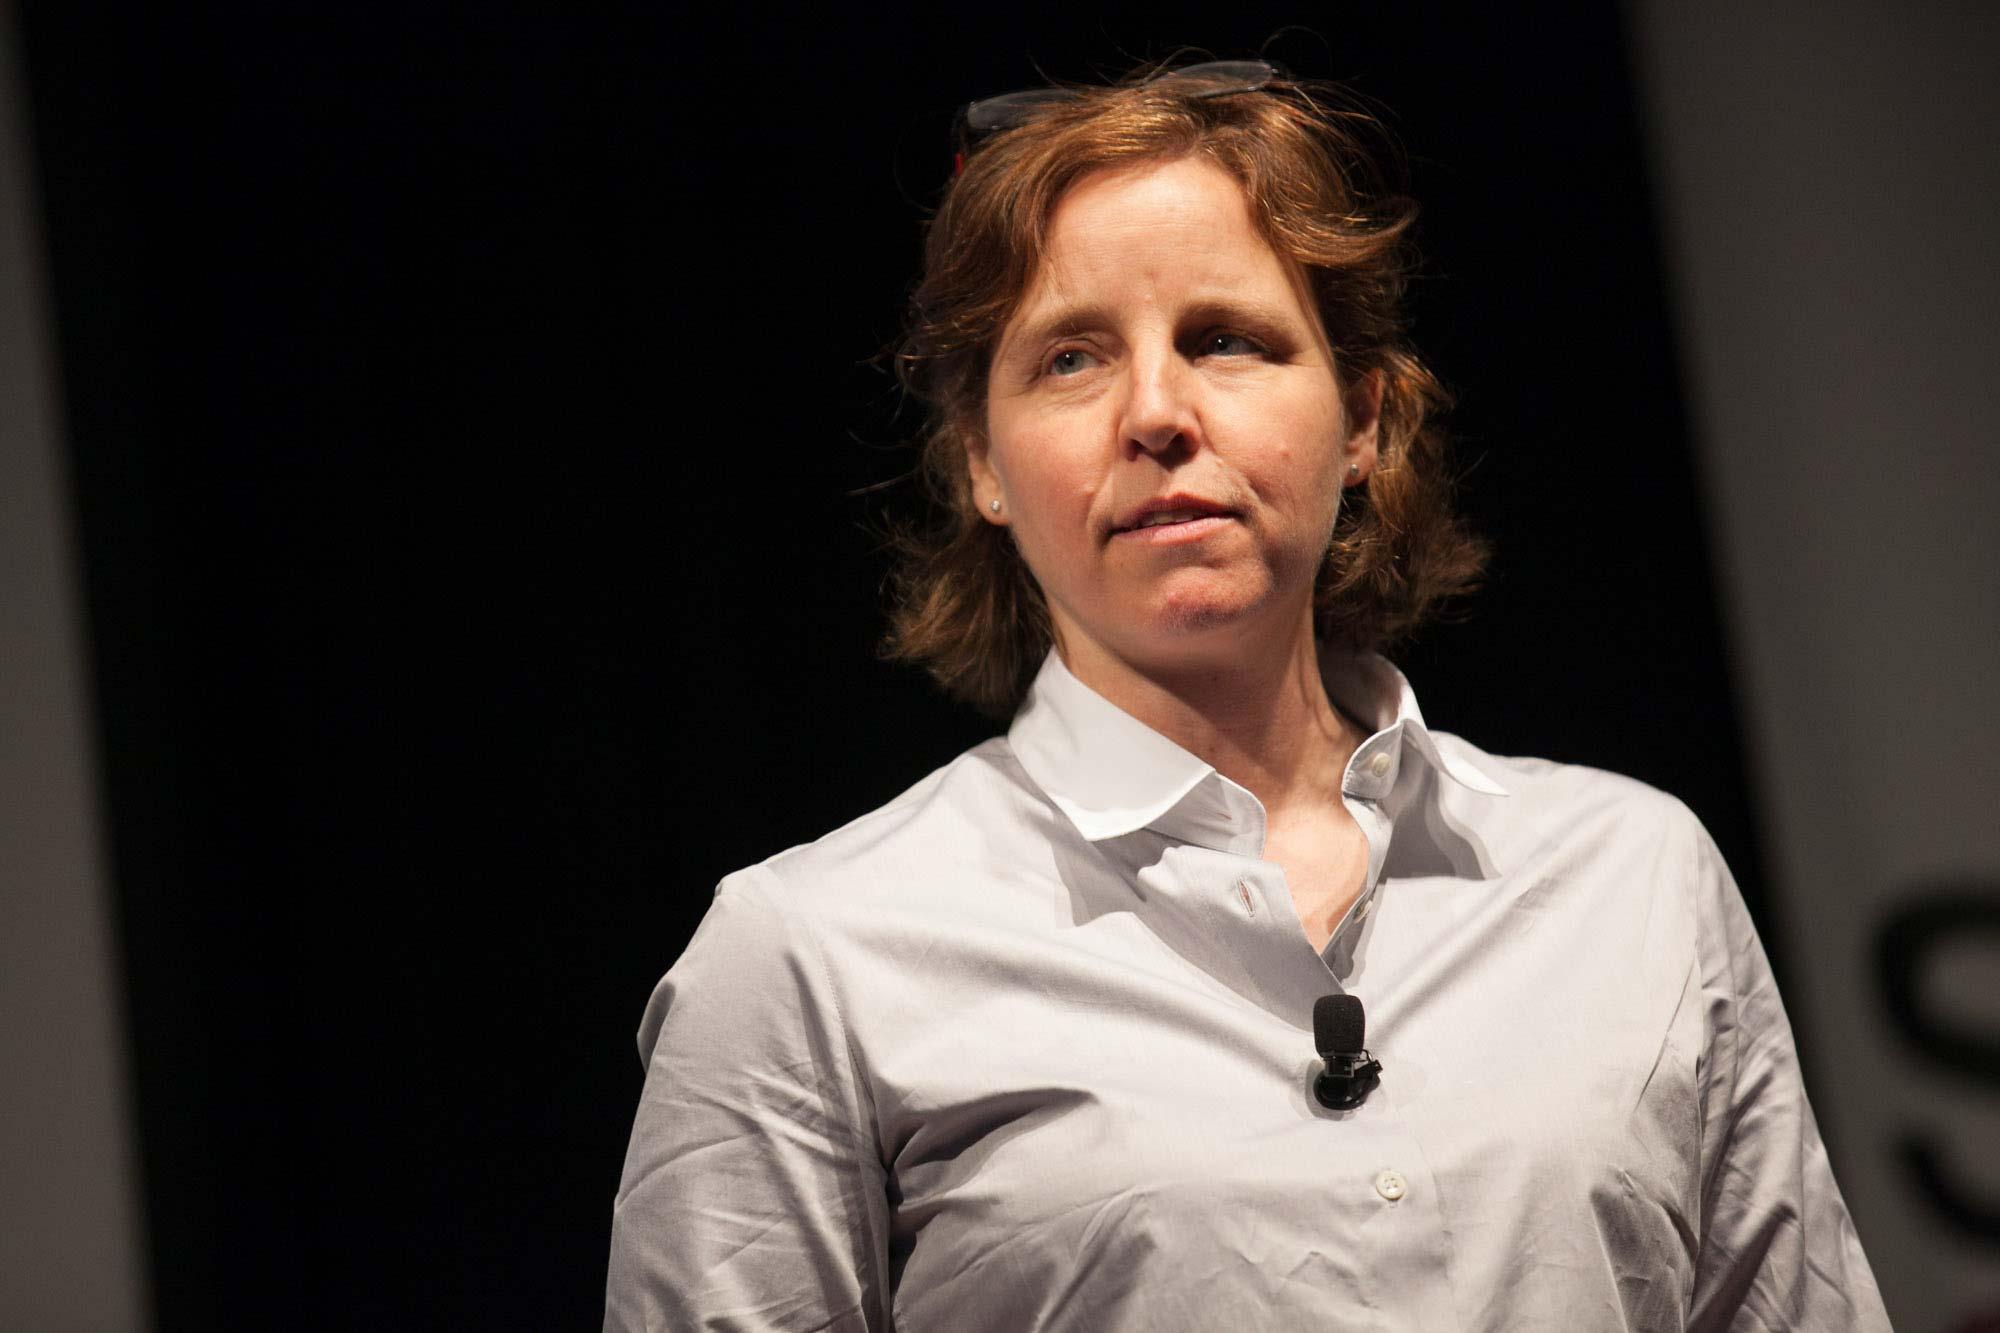 Megan Smith, VP of Google